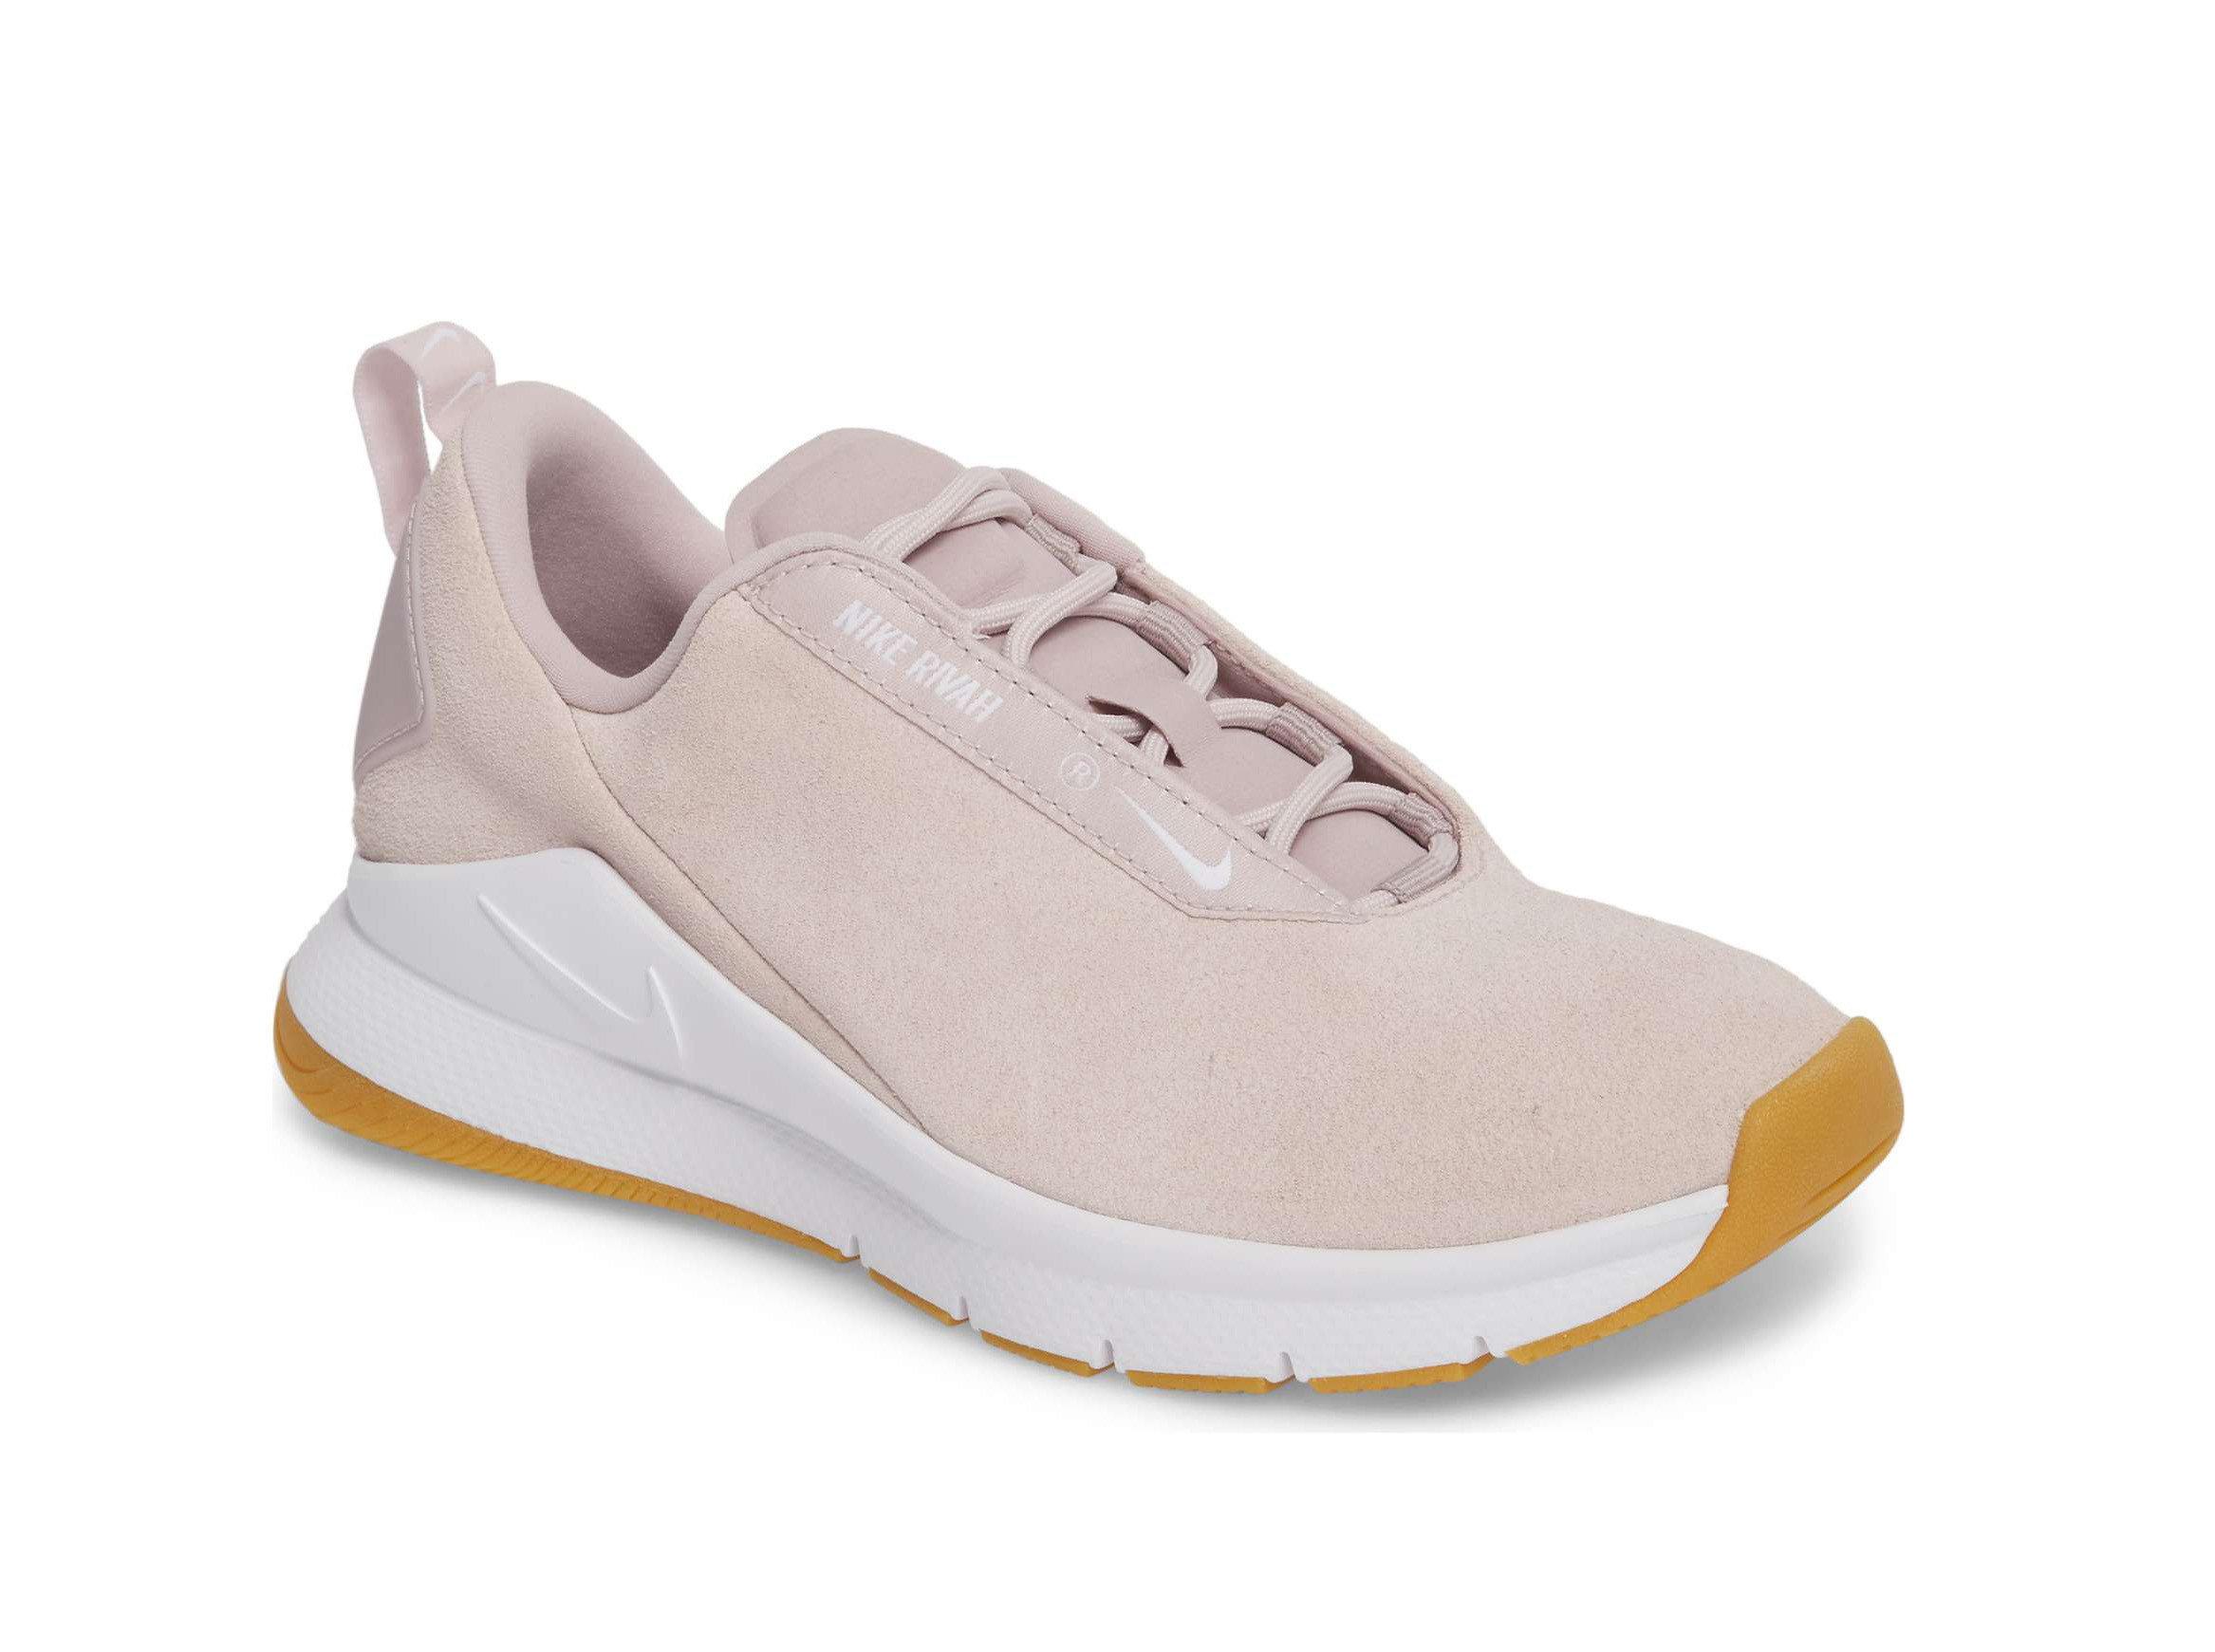 Health + Wellness Style + Design Travel Shop clothing footwear white shoe walking shoe product beige outdoor shoe product design sneakers cross training shoe tennis shoe running shoe sportswear